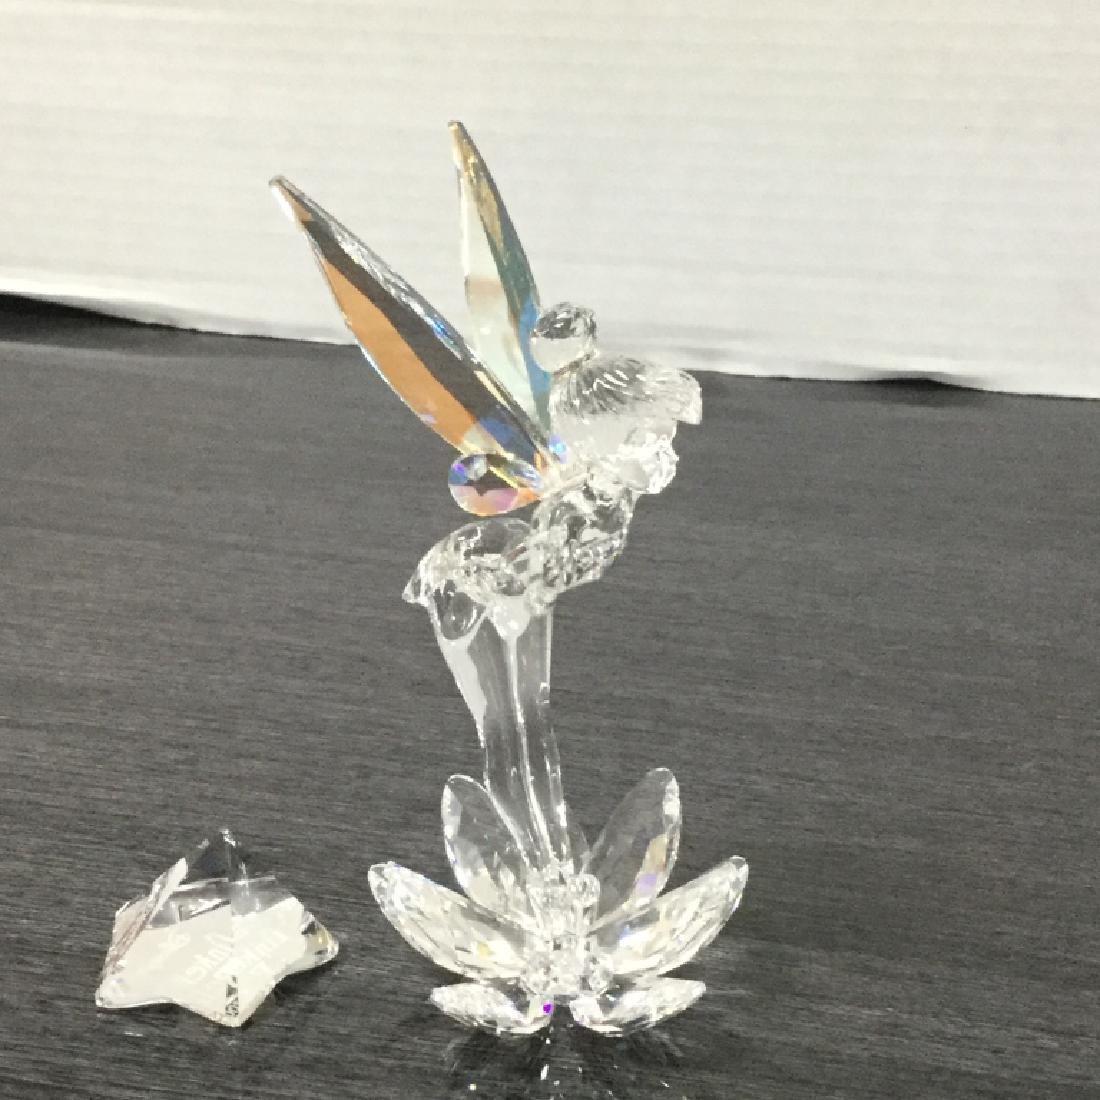 Swarovski Crystal 2008 Limited Edition Tinker Bell - 2